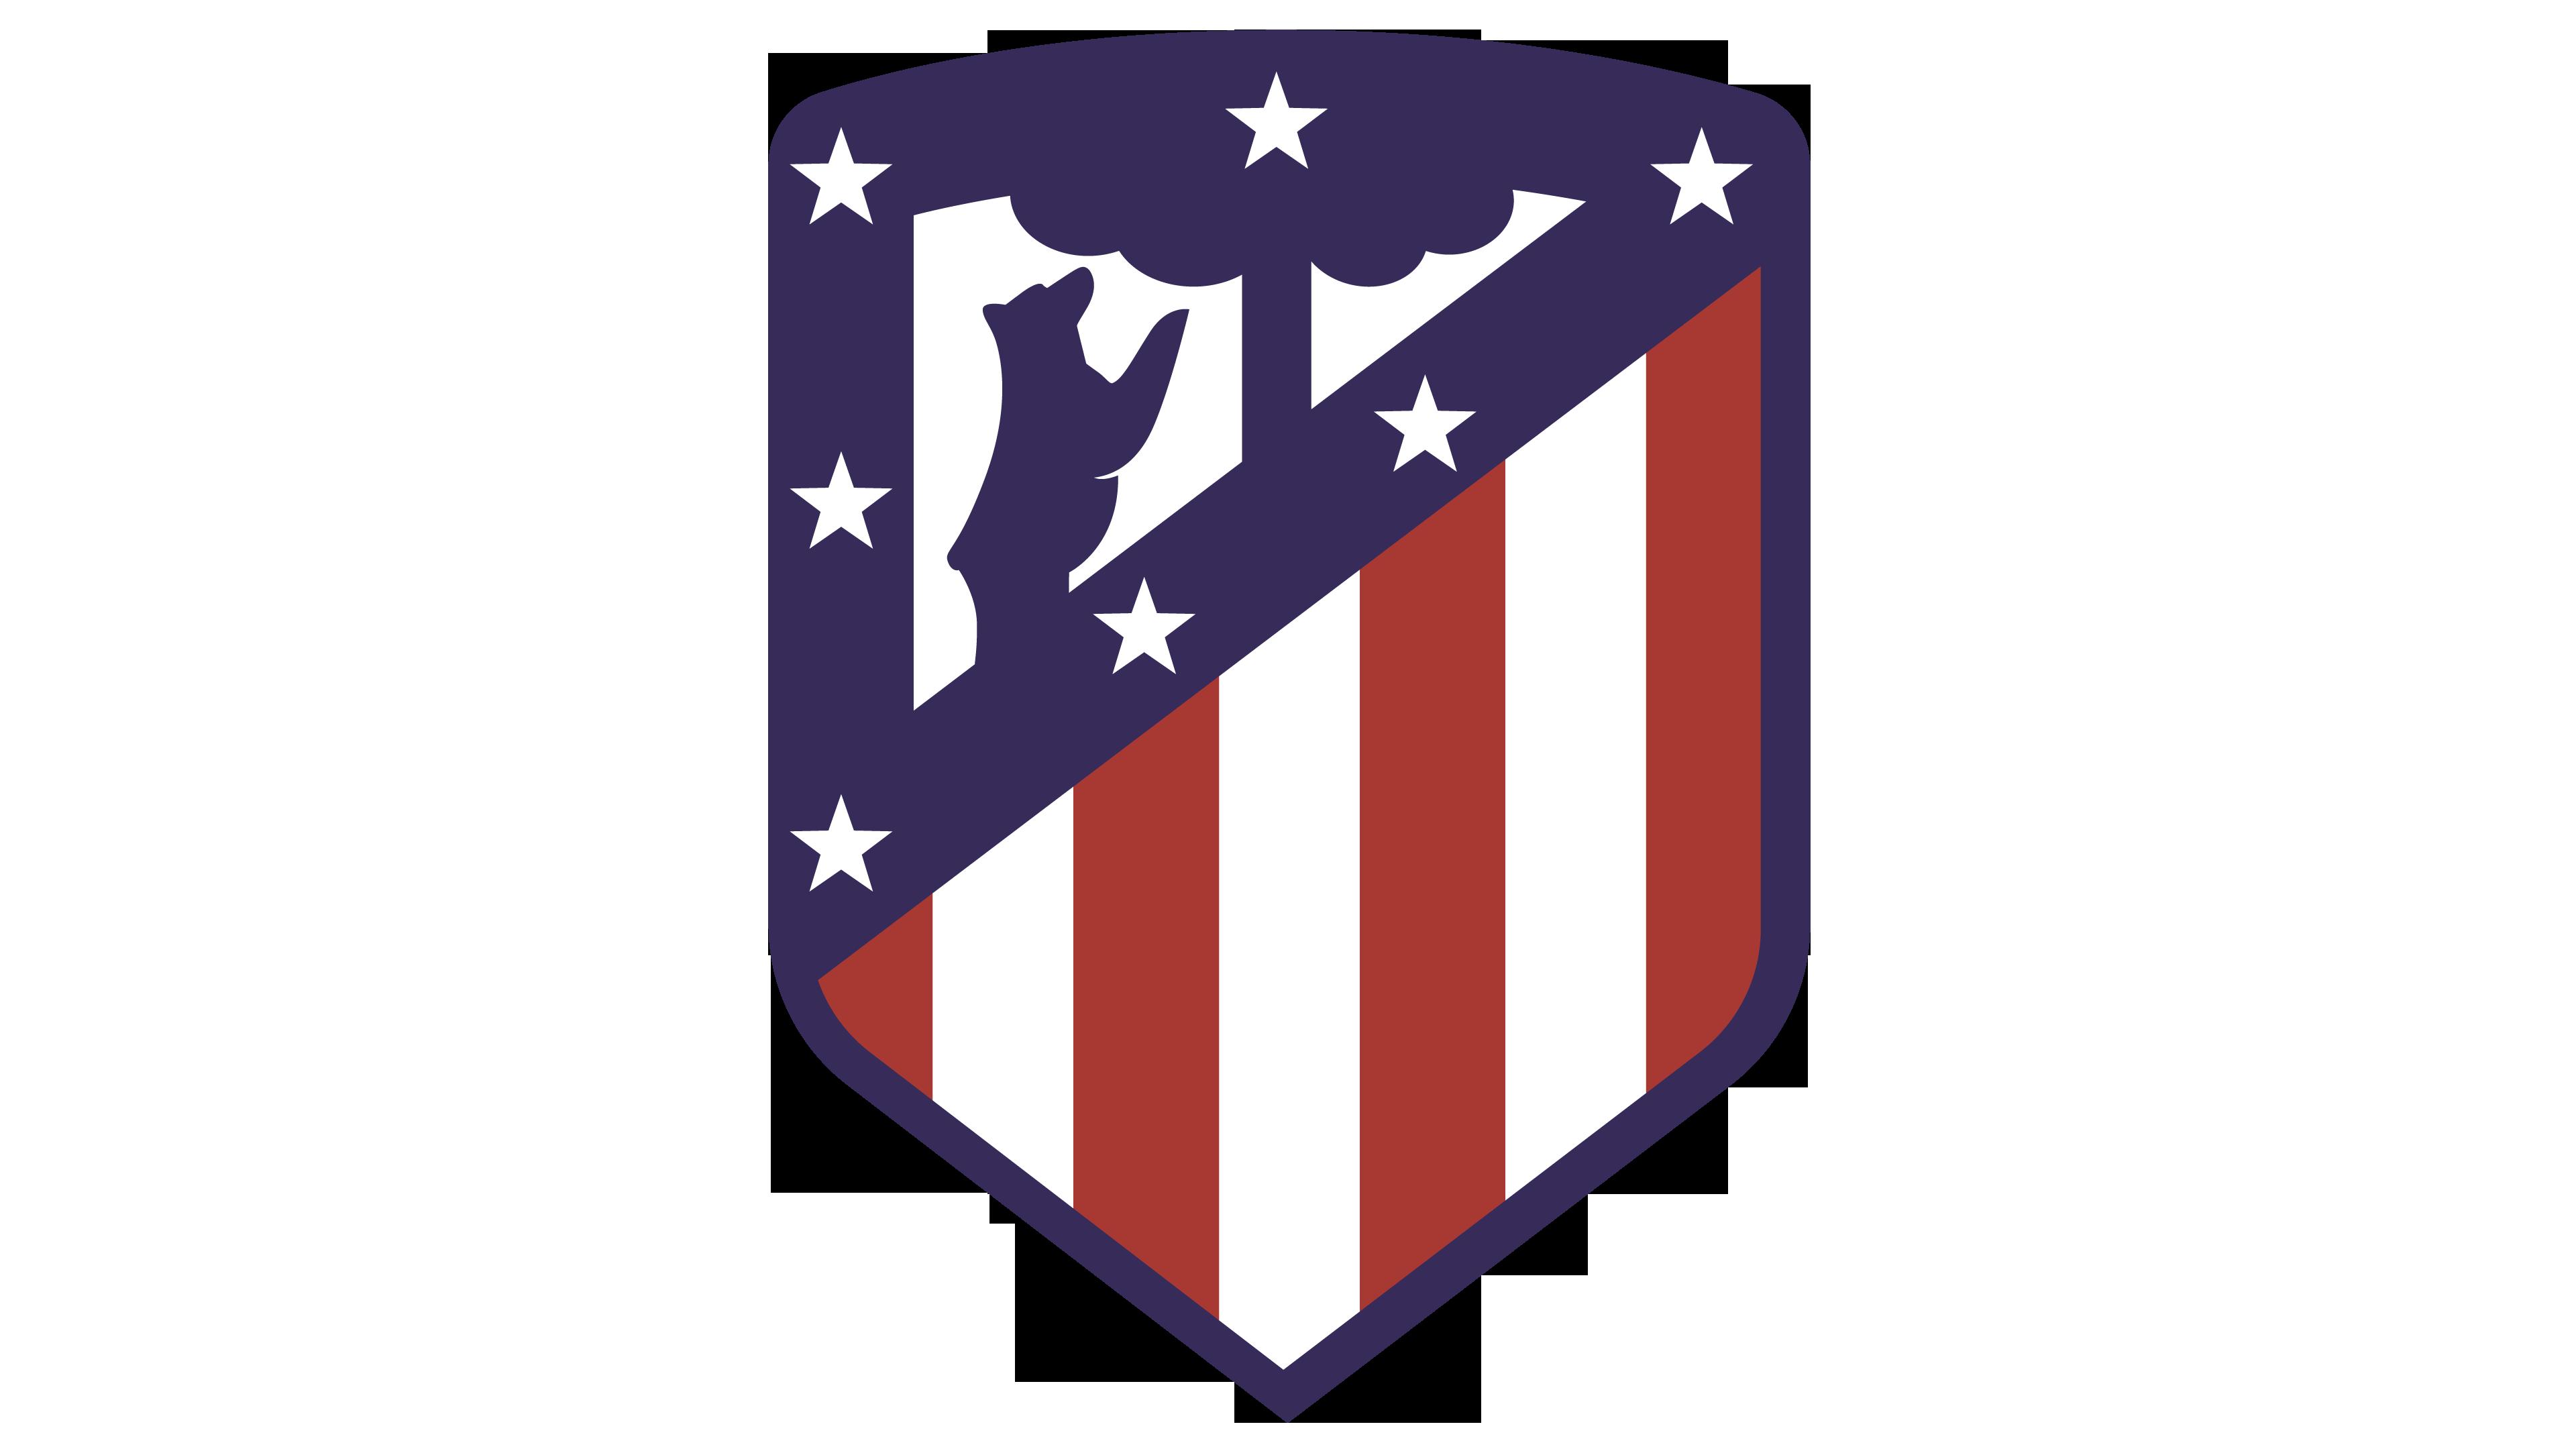 clip art free download Vector emblem stripes. Atletico madrid logo interesting